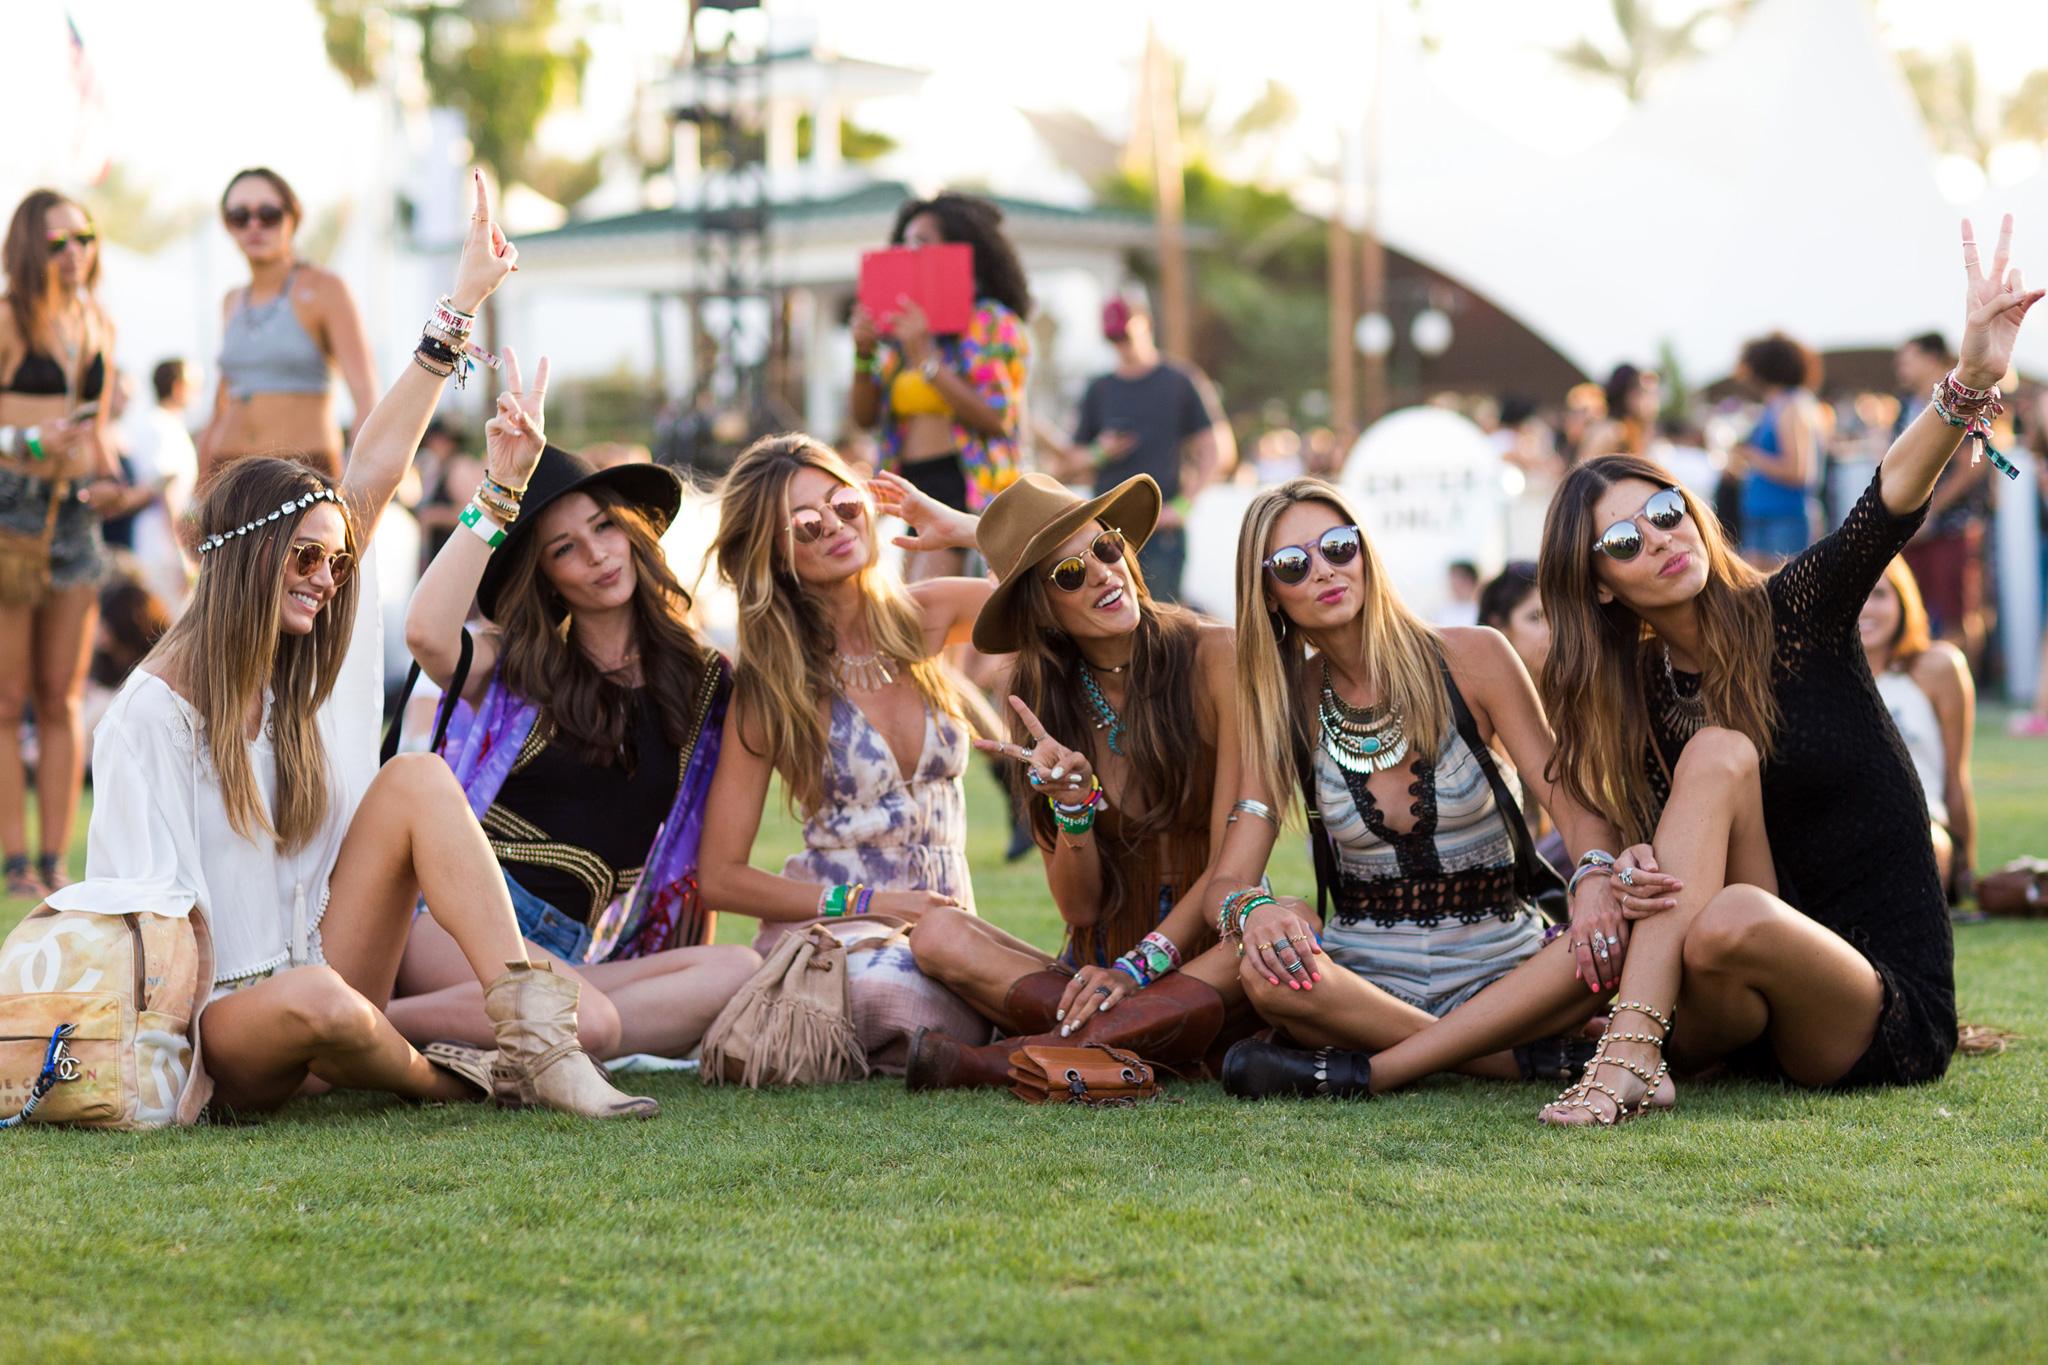 https://bellafruitella.files.wordpress.com/2015/04/coachella_2015-style-fashion-mode-festival-outfit-ootd-hippie-style-street.jpg